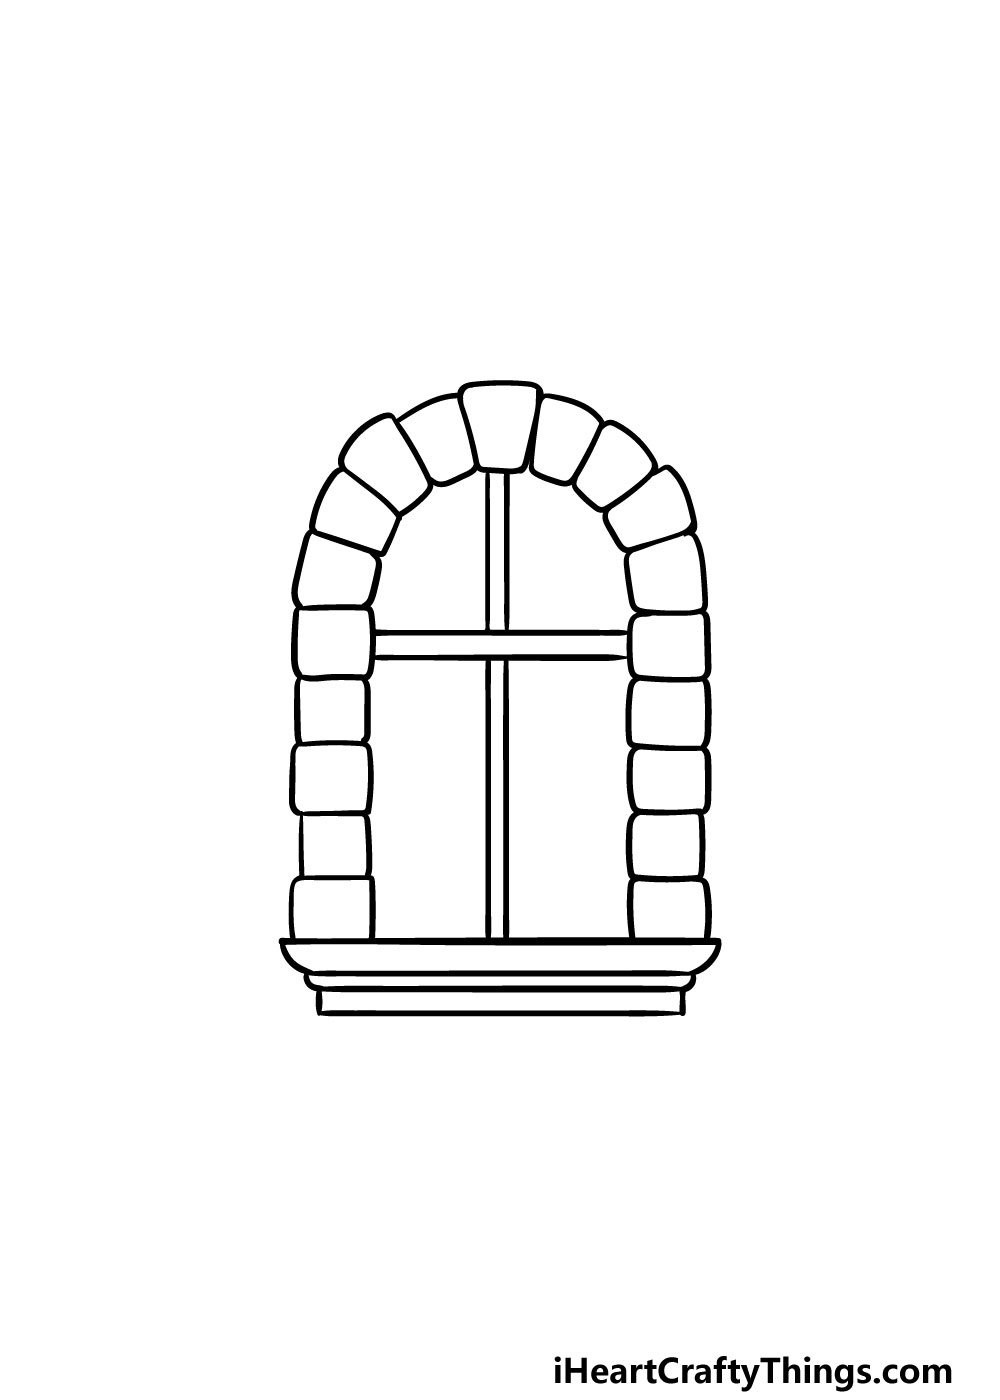 drawing a window step 4